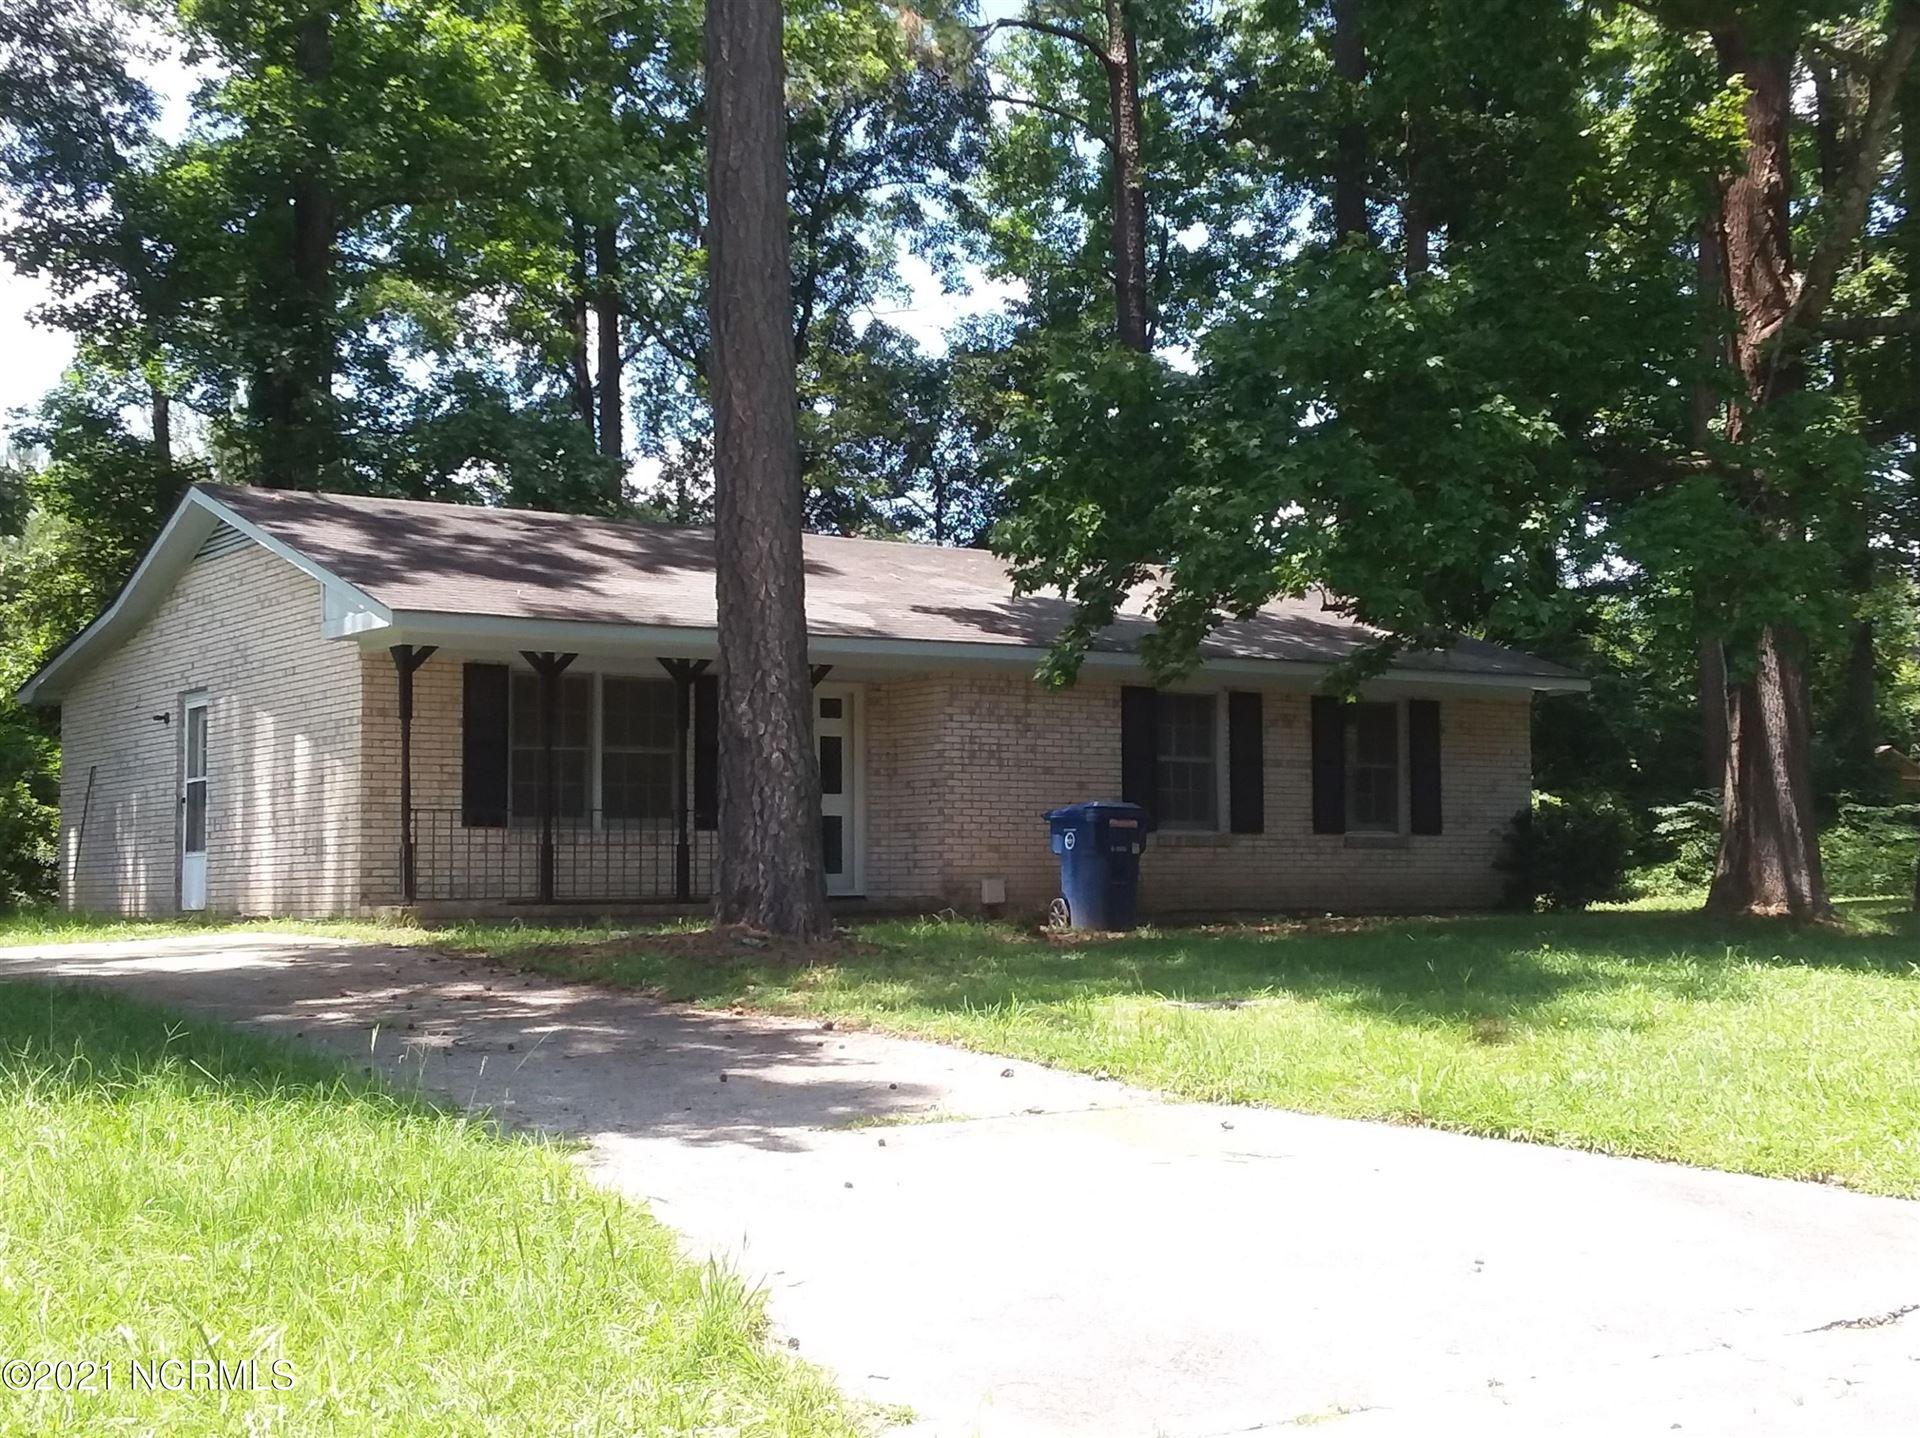 Photo of 1610 Farmgate Road, Kinston, NC 28504 (MLS # 100279503)